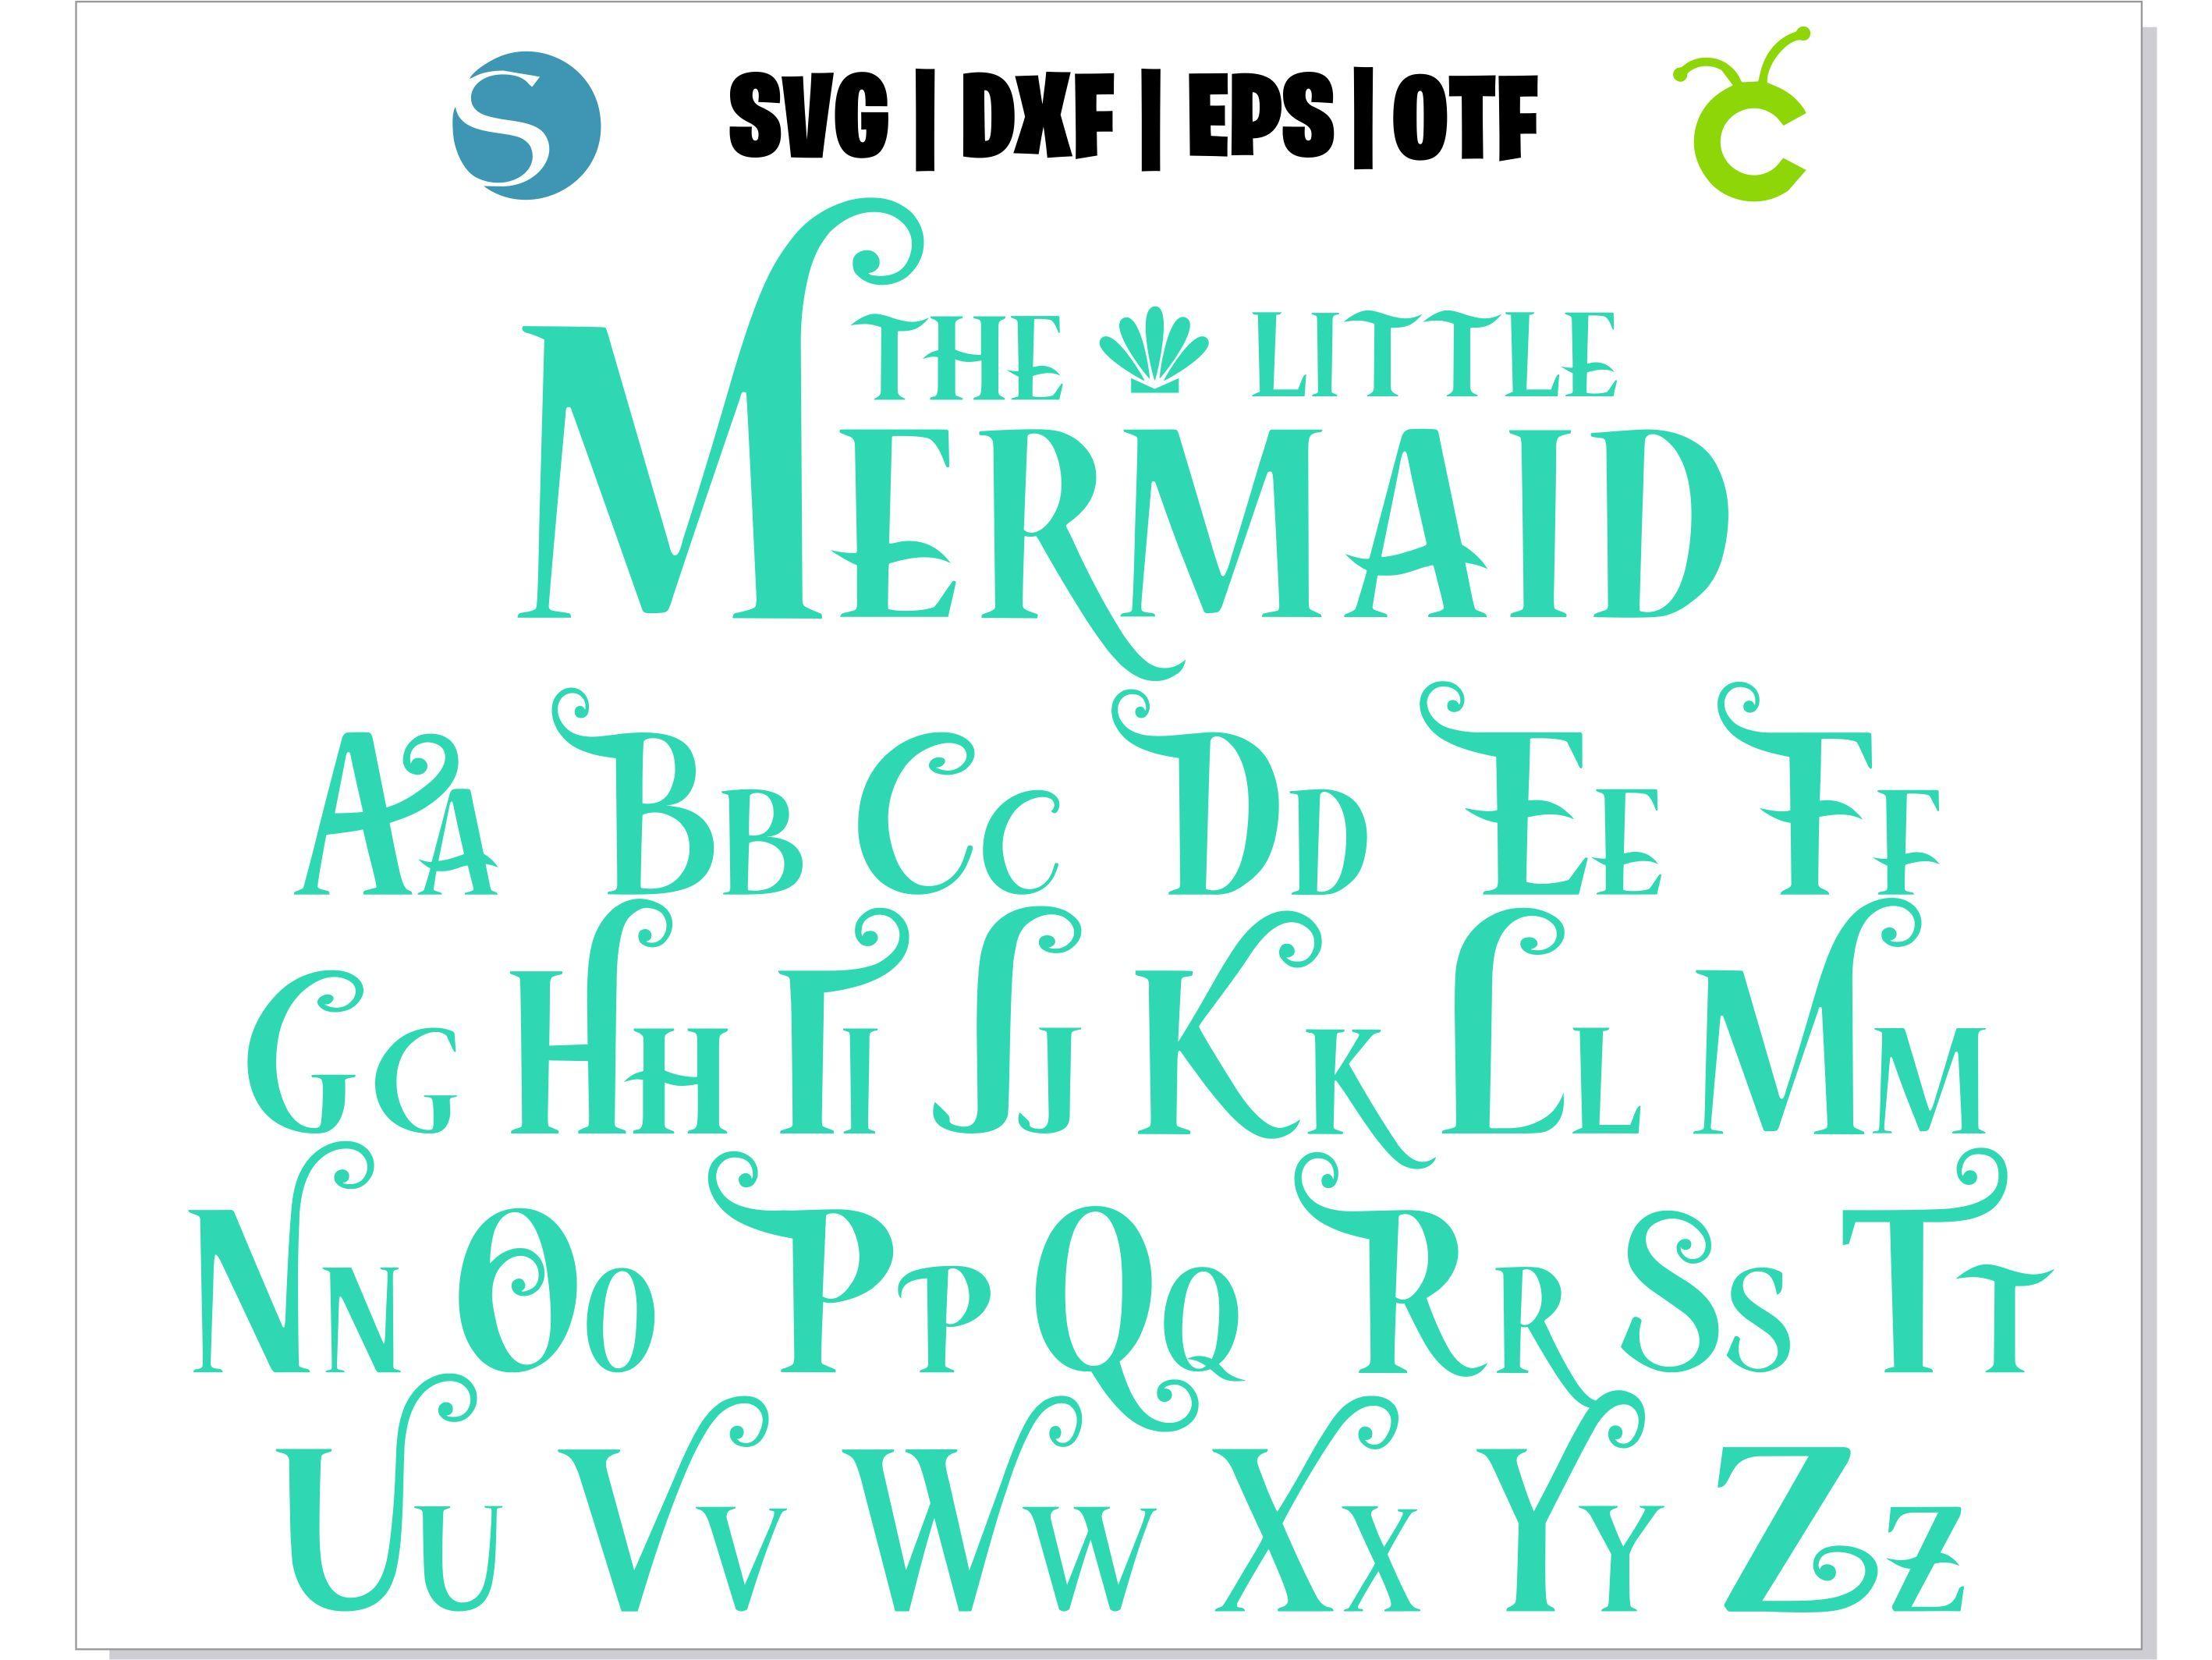 Mermaid Font Svg Mermaid Font Otf Mermaid By Hotfont On Zibbet